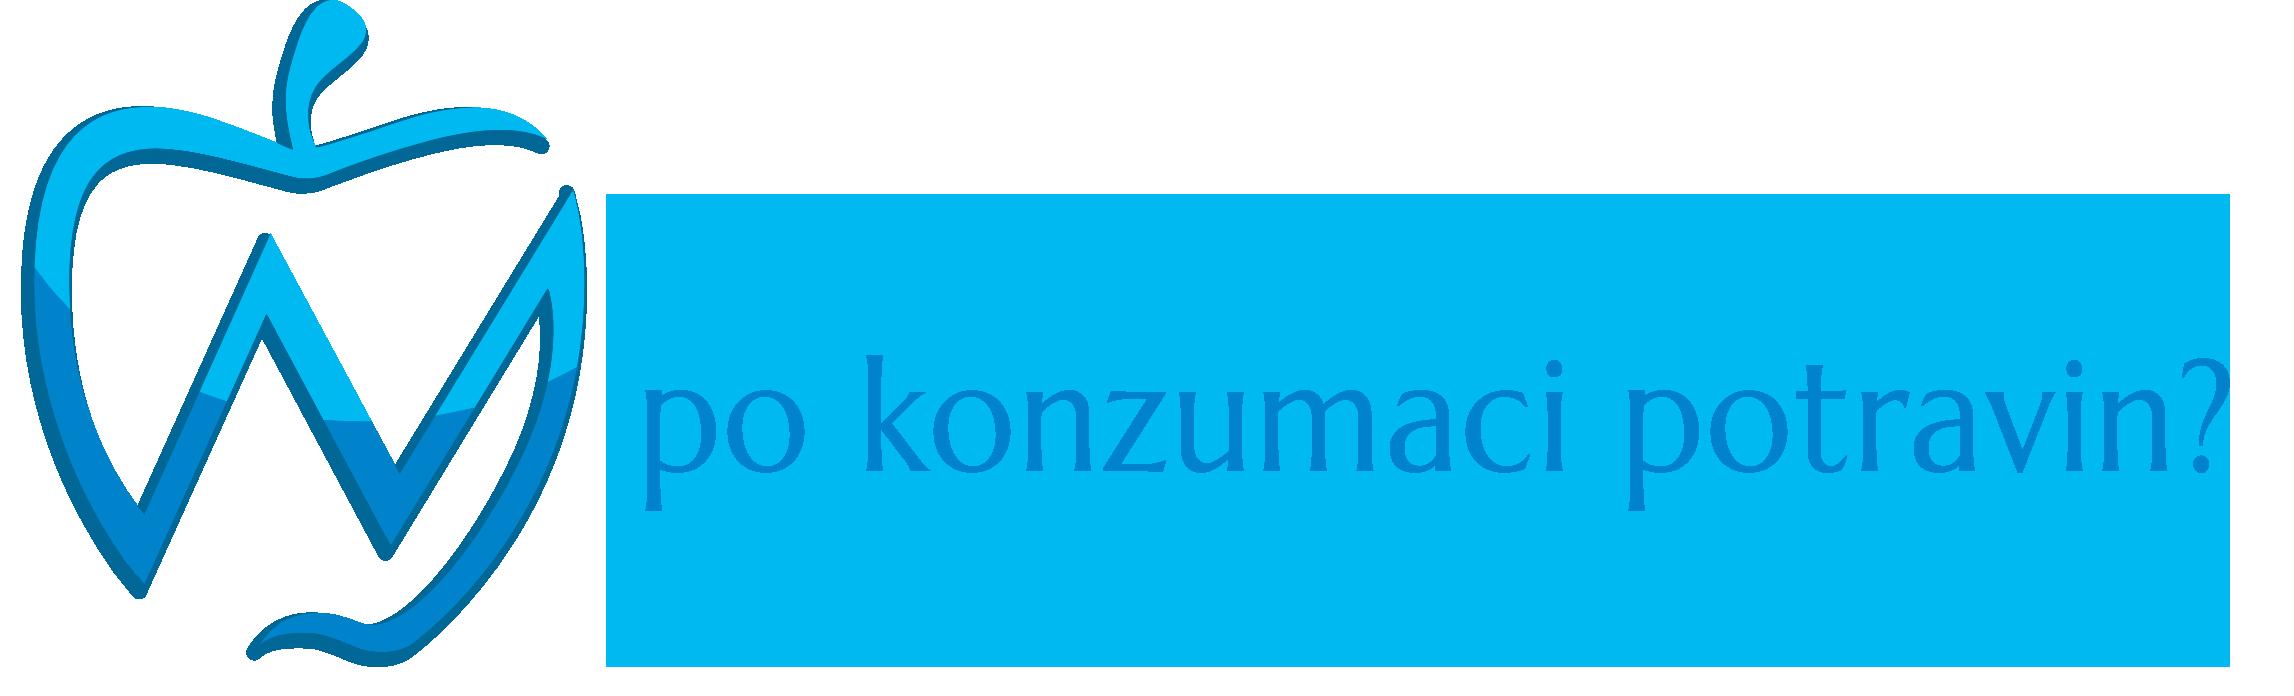 Varianta obdélník_JV modré